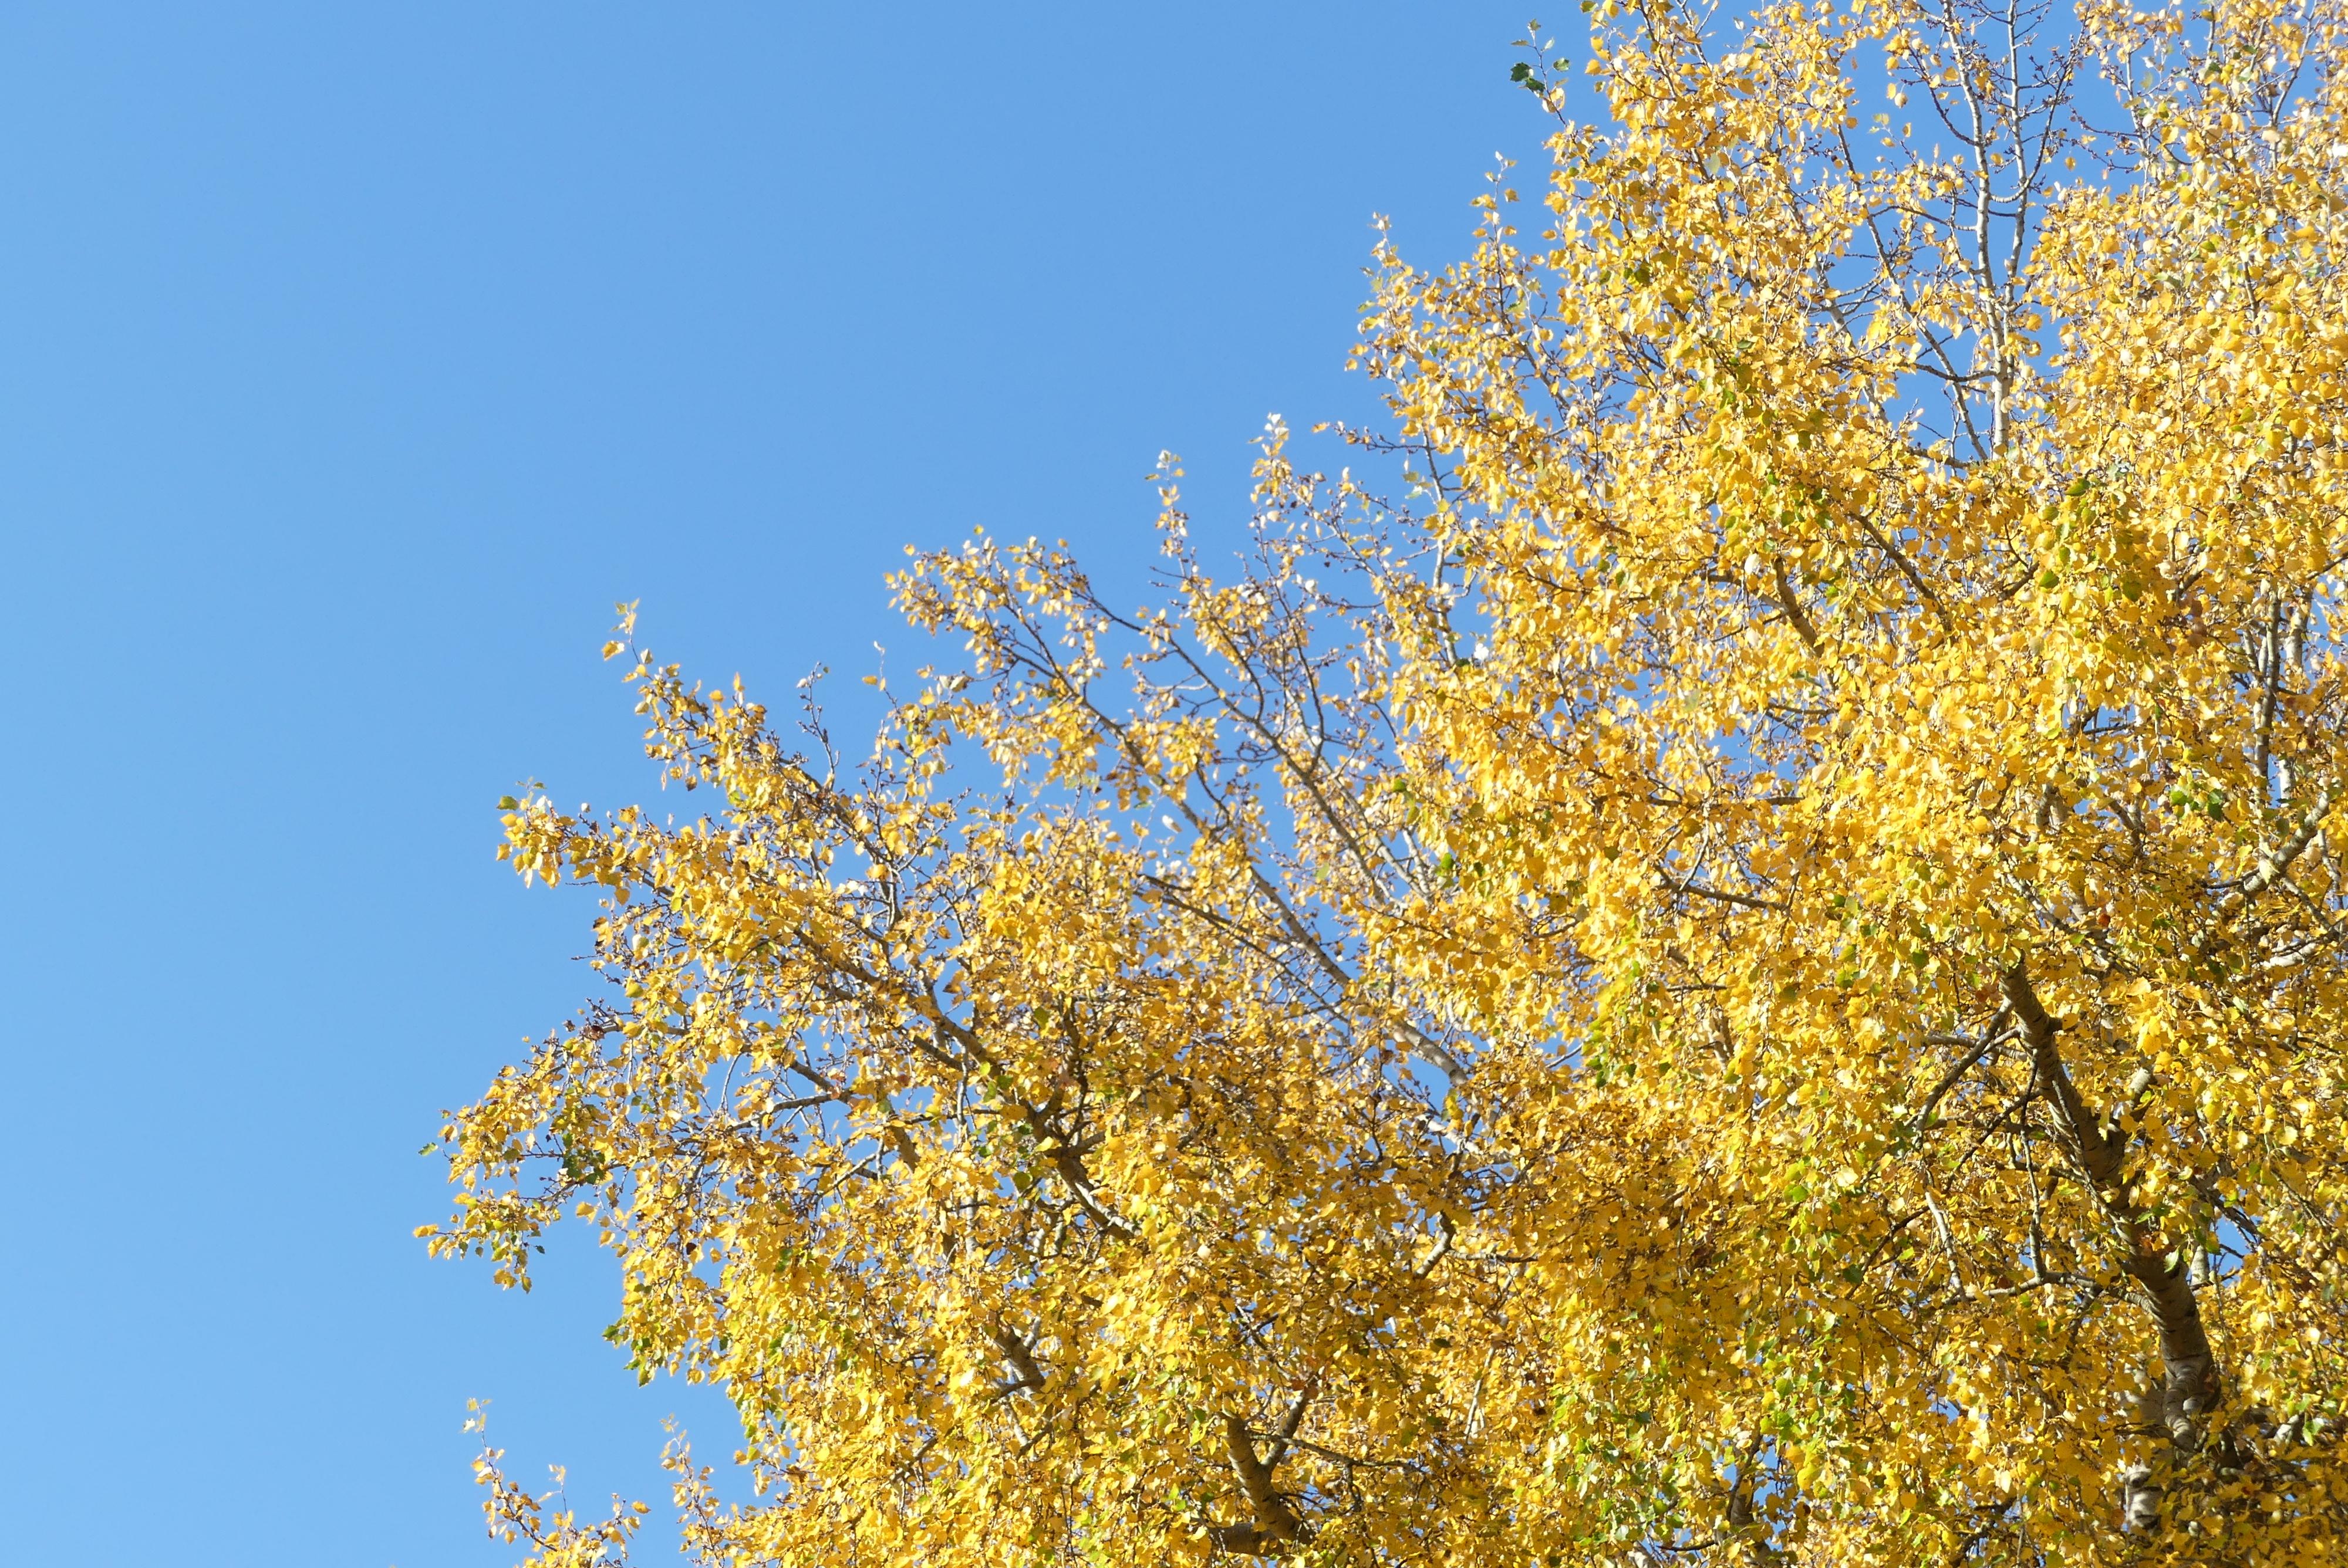 Herbstfarben in Maastricht